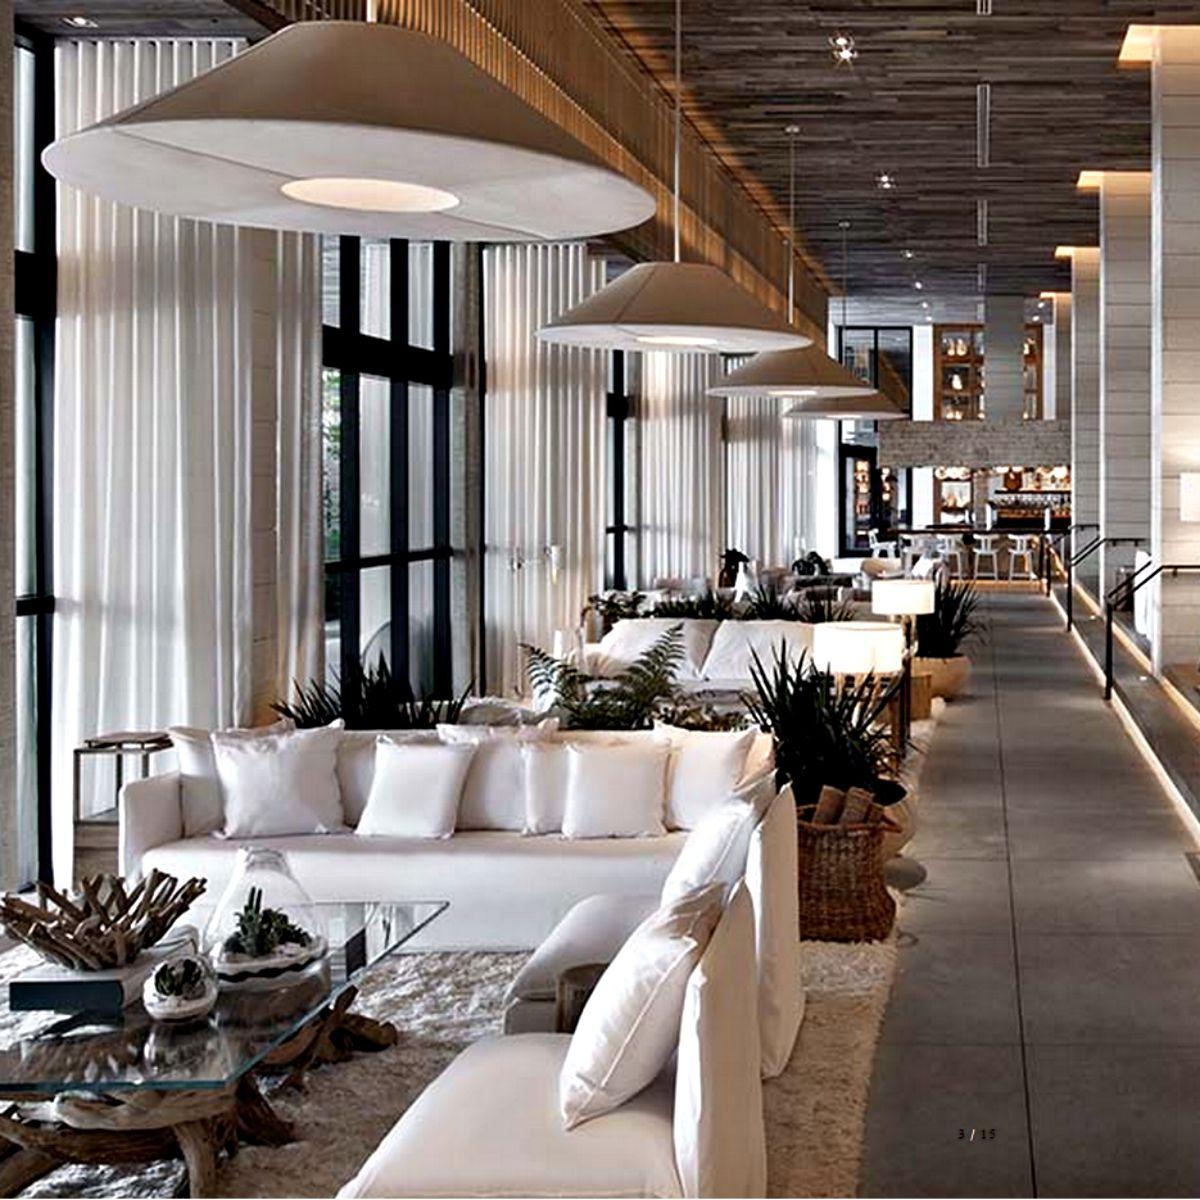 1 Hotel South Beach, Boutique Beachfront Miami(3) - Copy.png